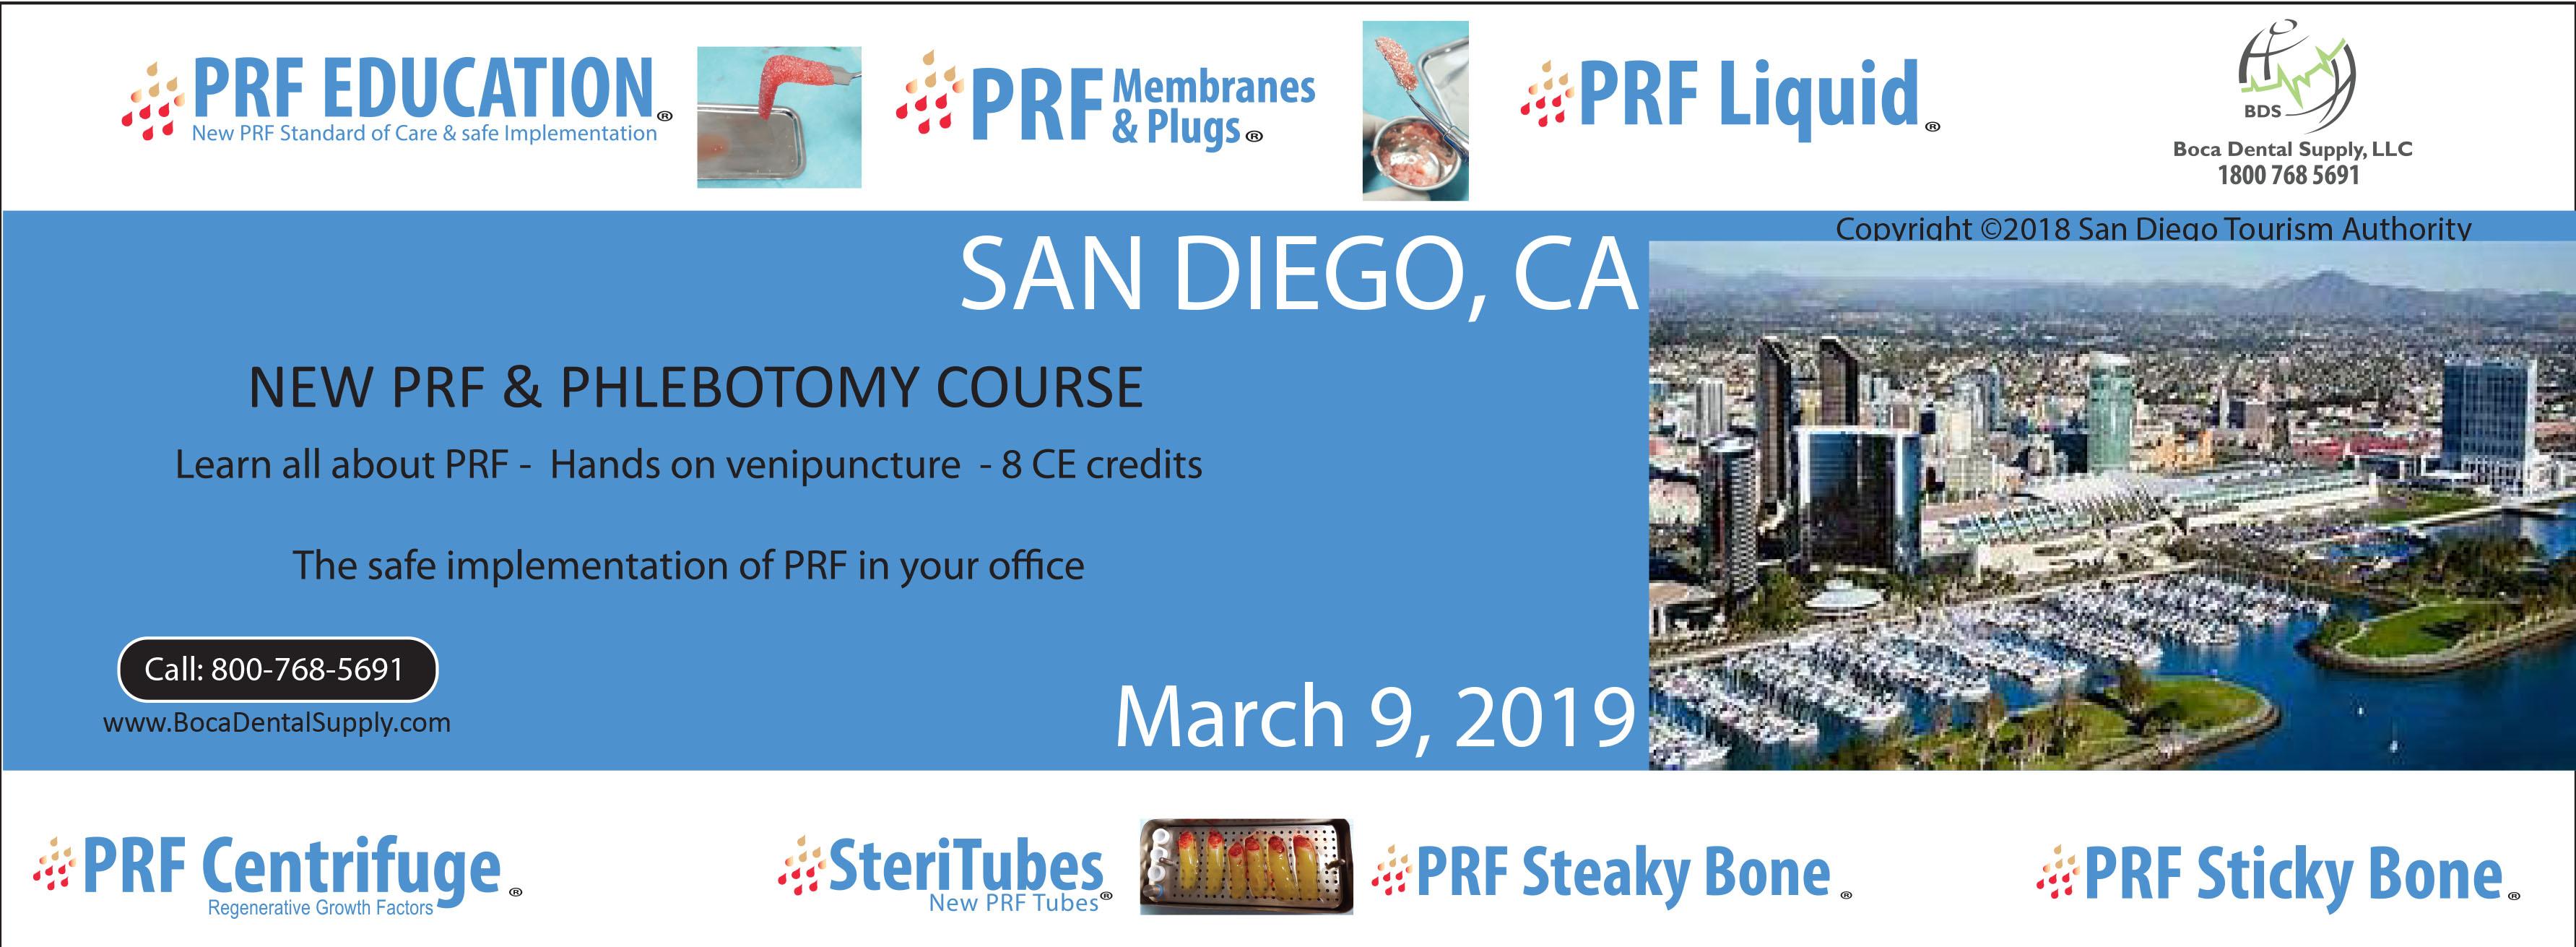 prf-course-san-diego-2019.jpg